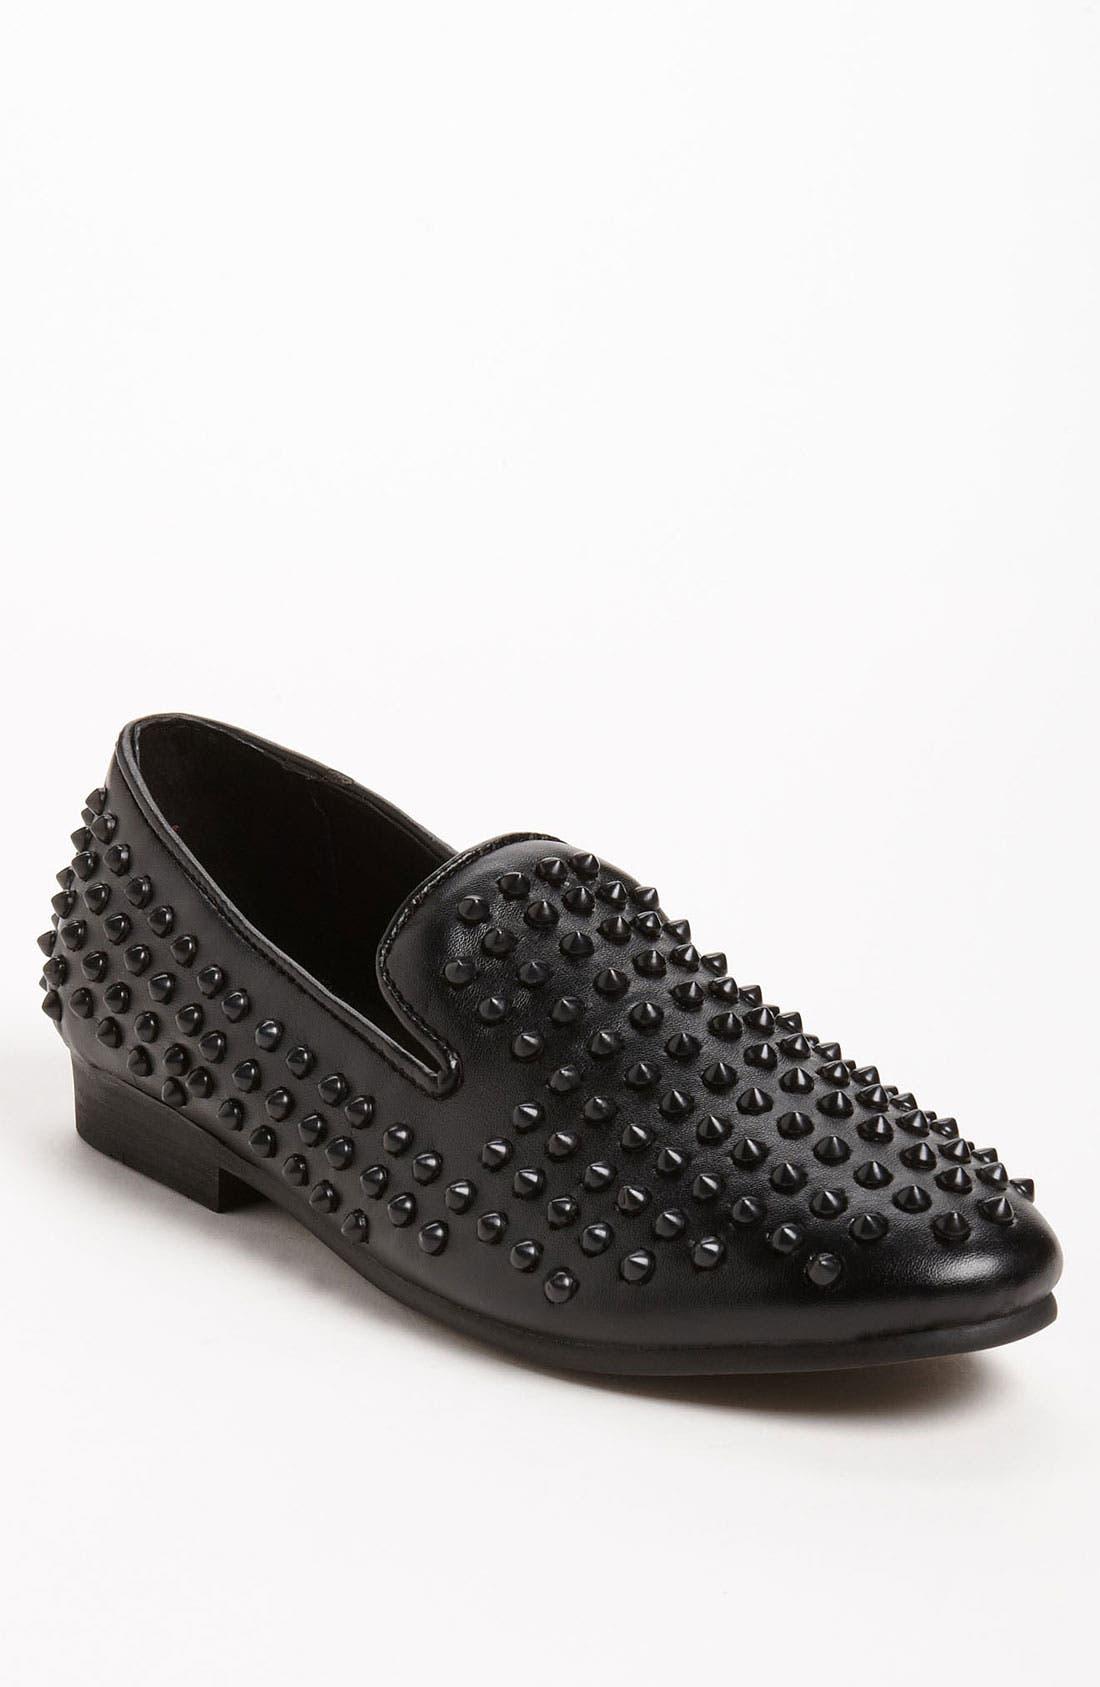 Alternate Image 1 Selected - Steve Madden 'Jagggrr' Studded Loafer